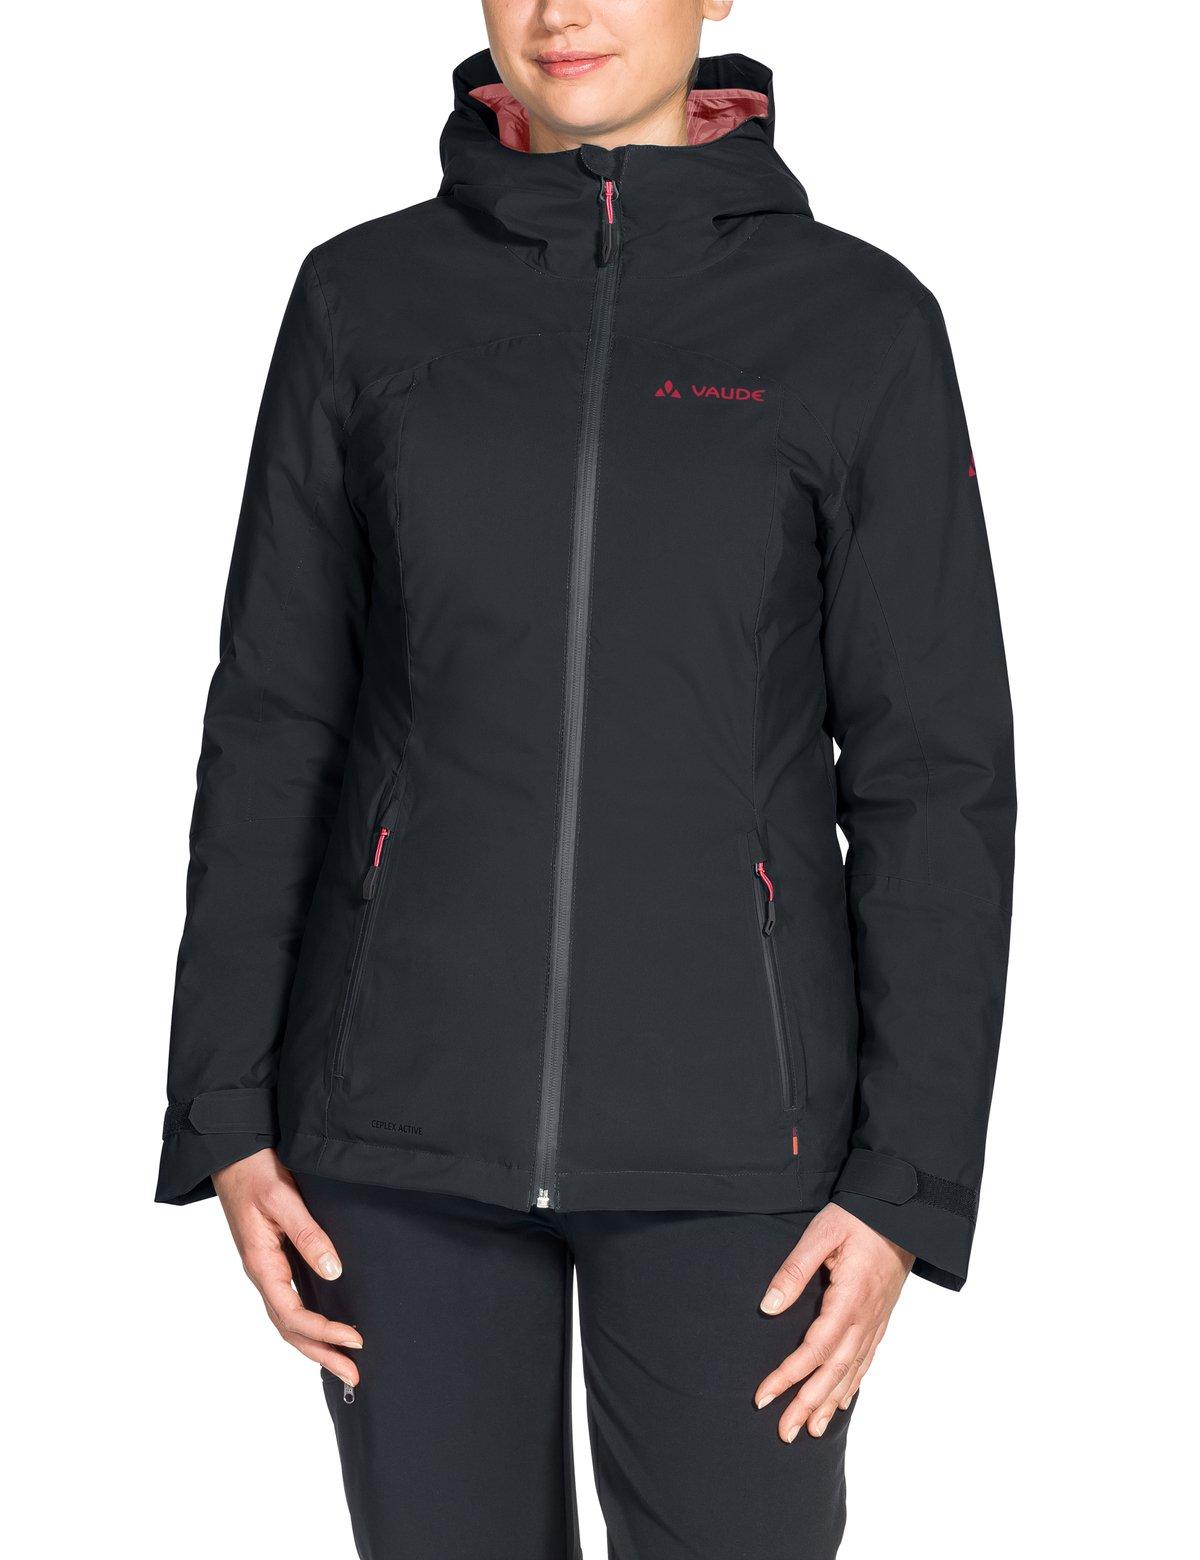 61bFRLLx4eL - VAUDE Women's Carbisdale Jacket